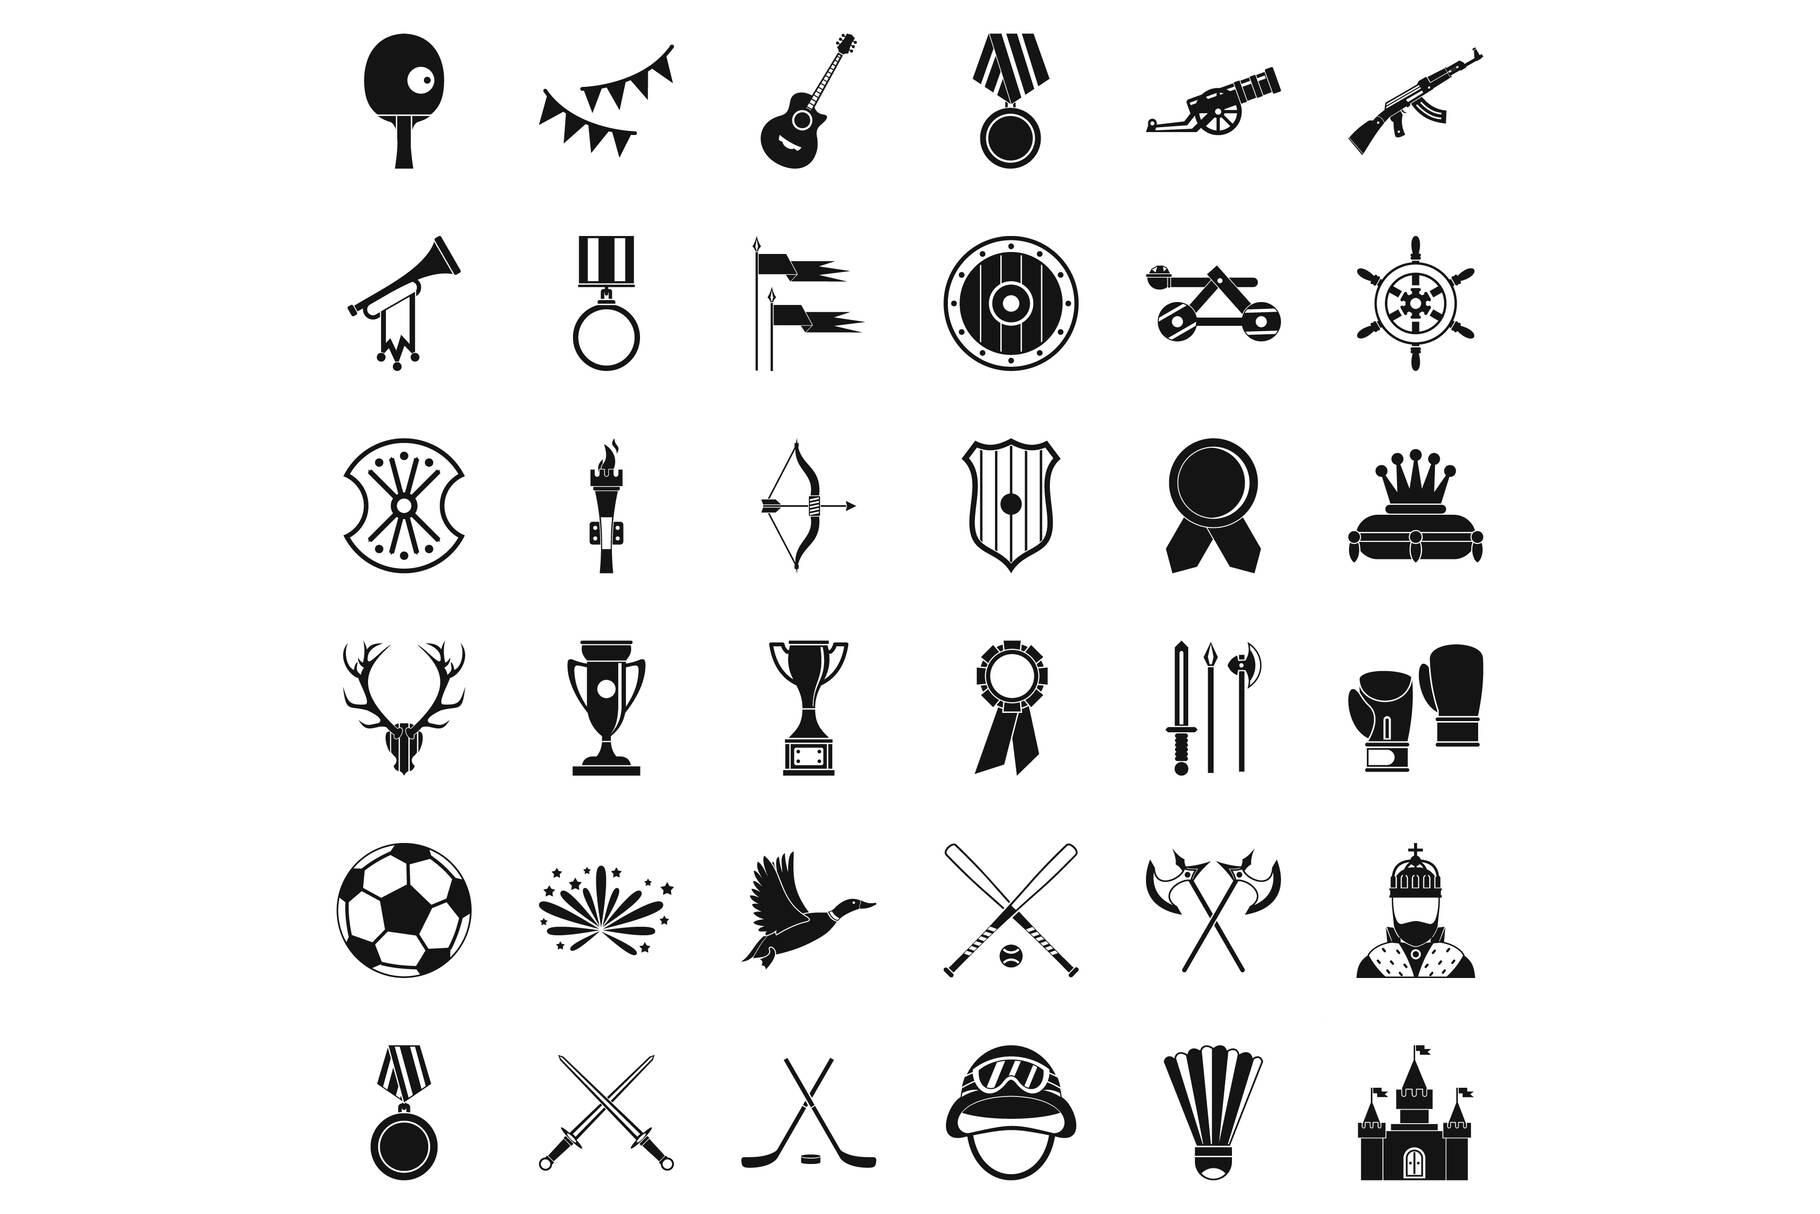 Award icons set, simple style example image 1